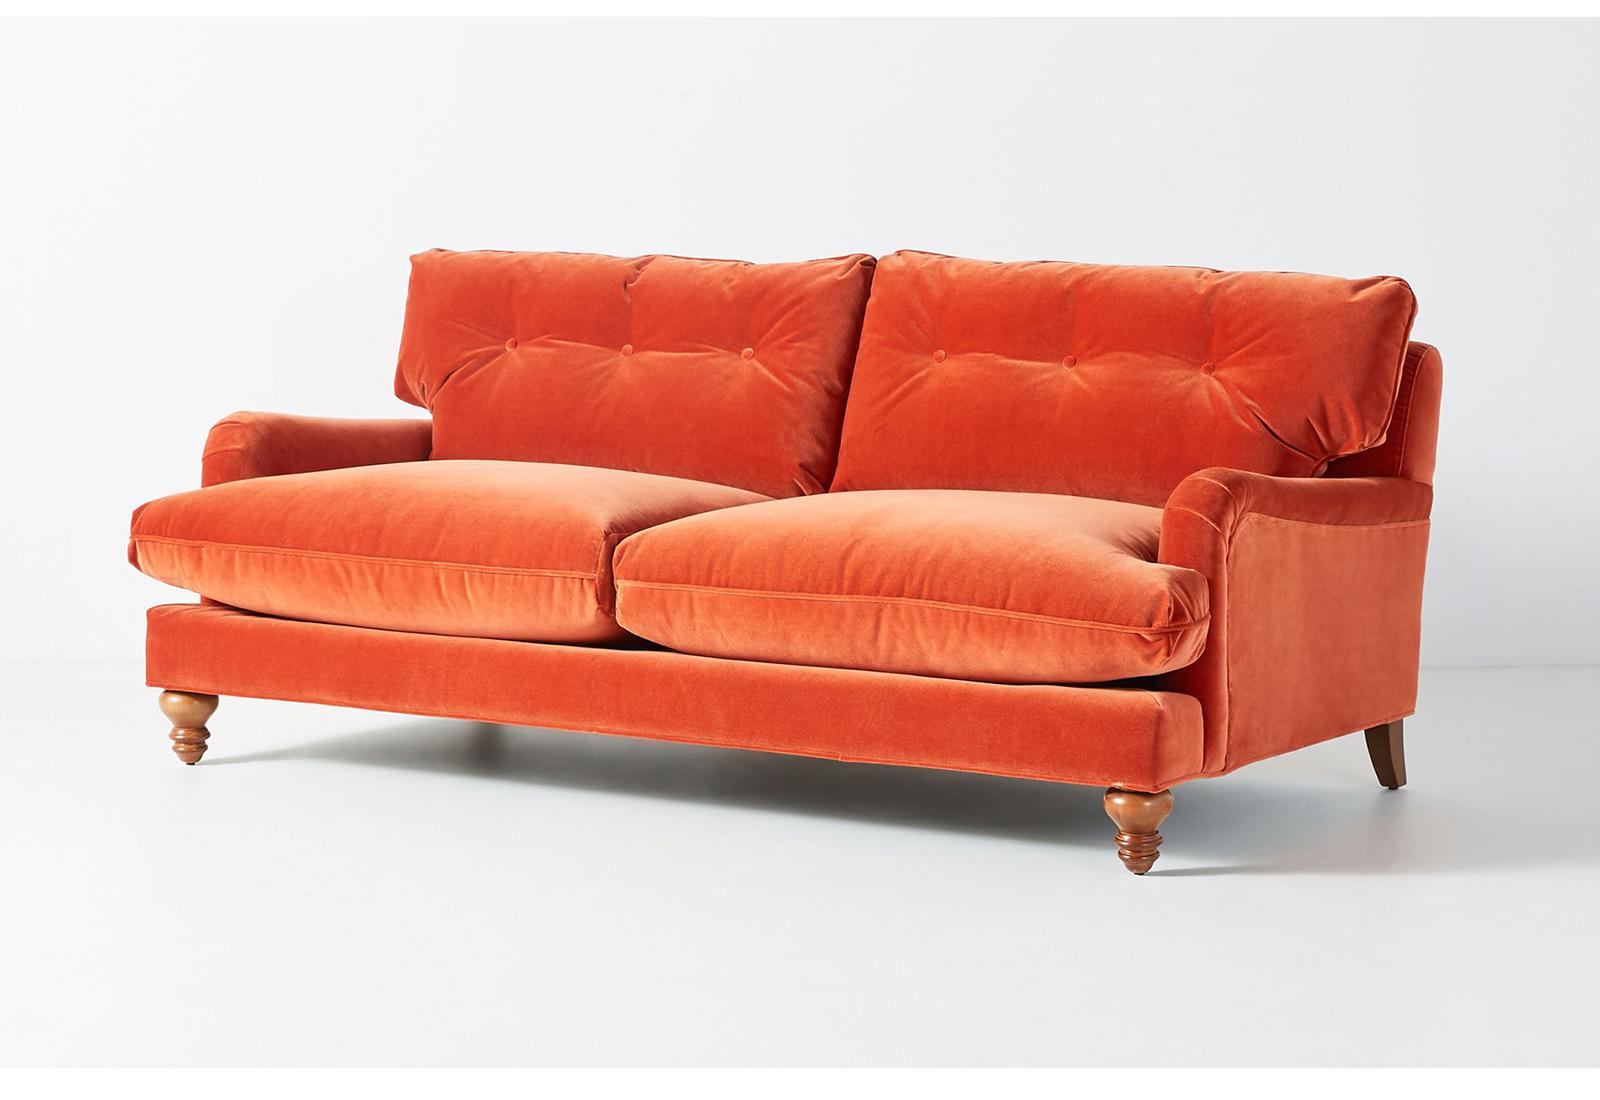 Find An Orange Couch Inspired By Friends Tv Show Cnn Underscored